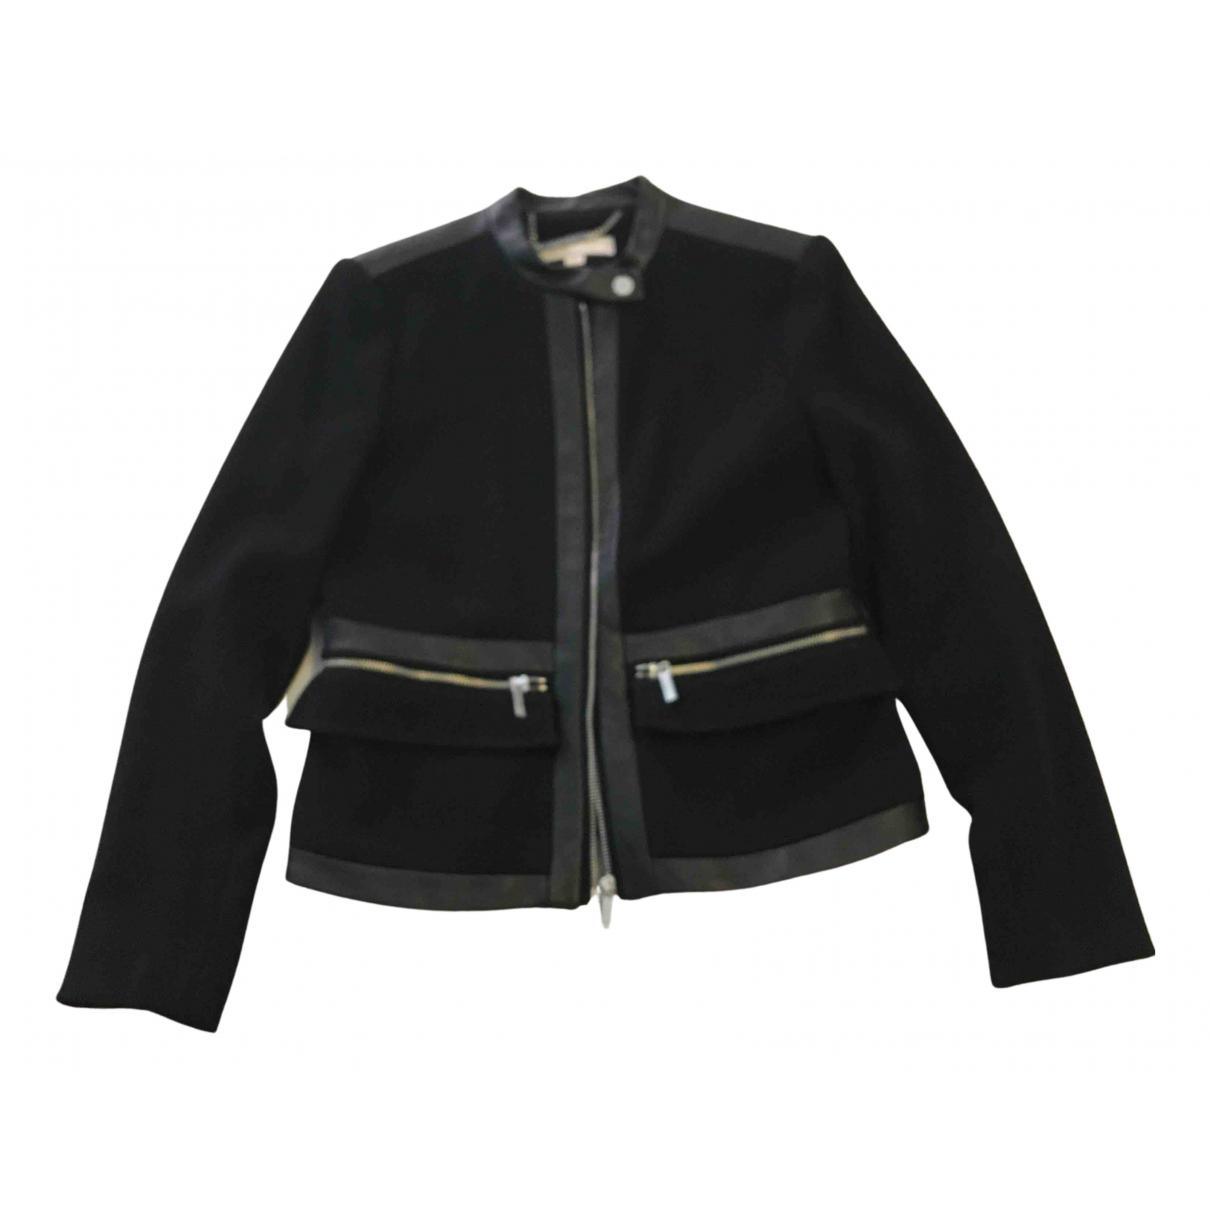 Michael Kors N Black jacket for Women 8 US